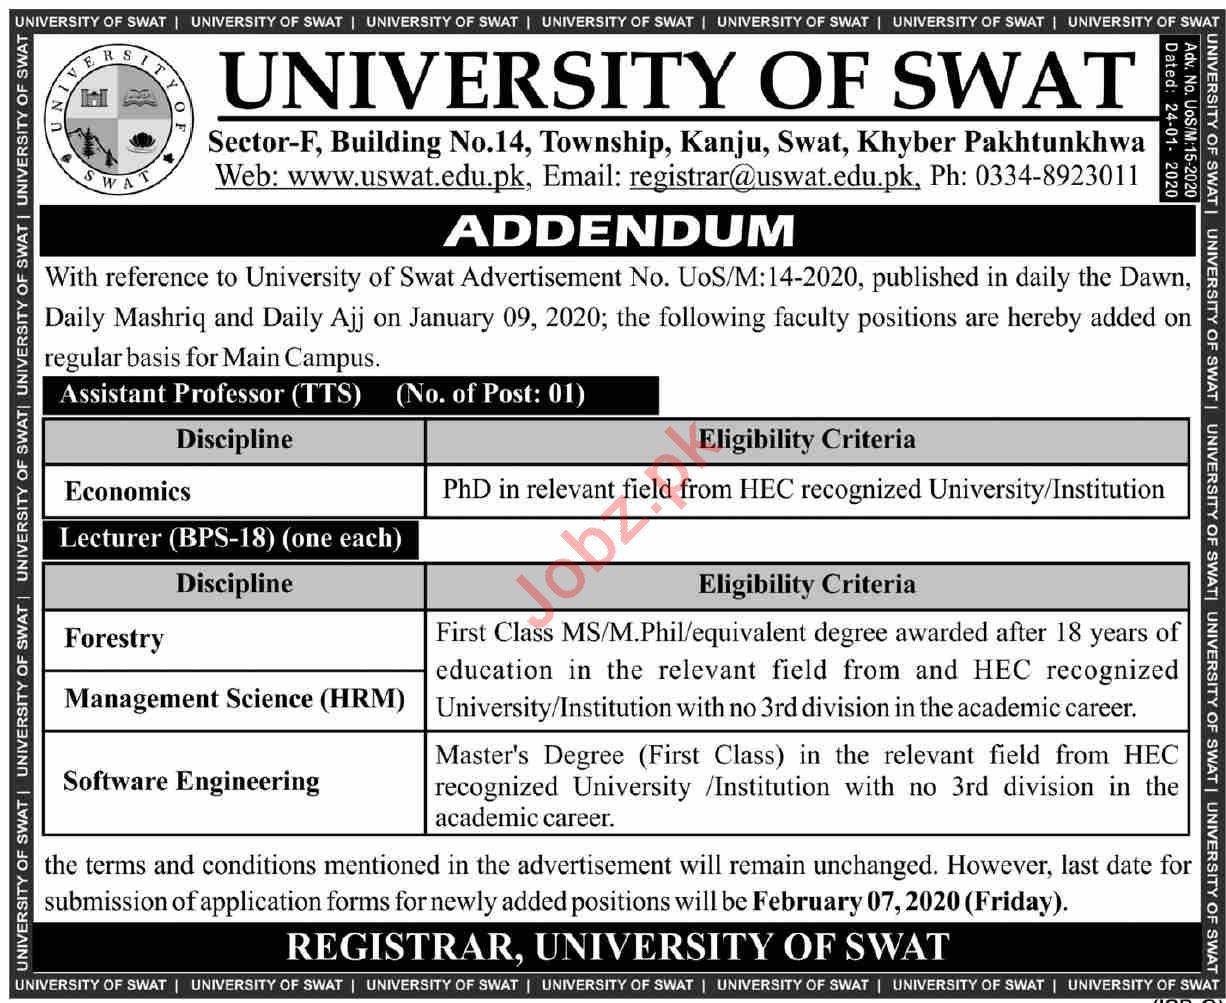 University of Swat Jobs 2020 for Assistant Professors